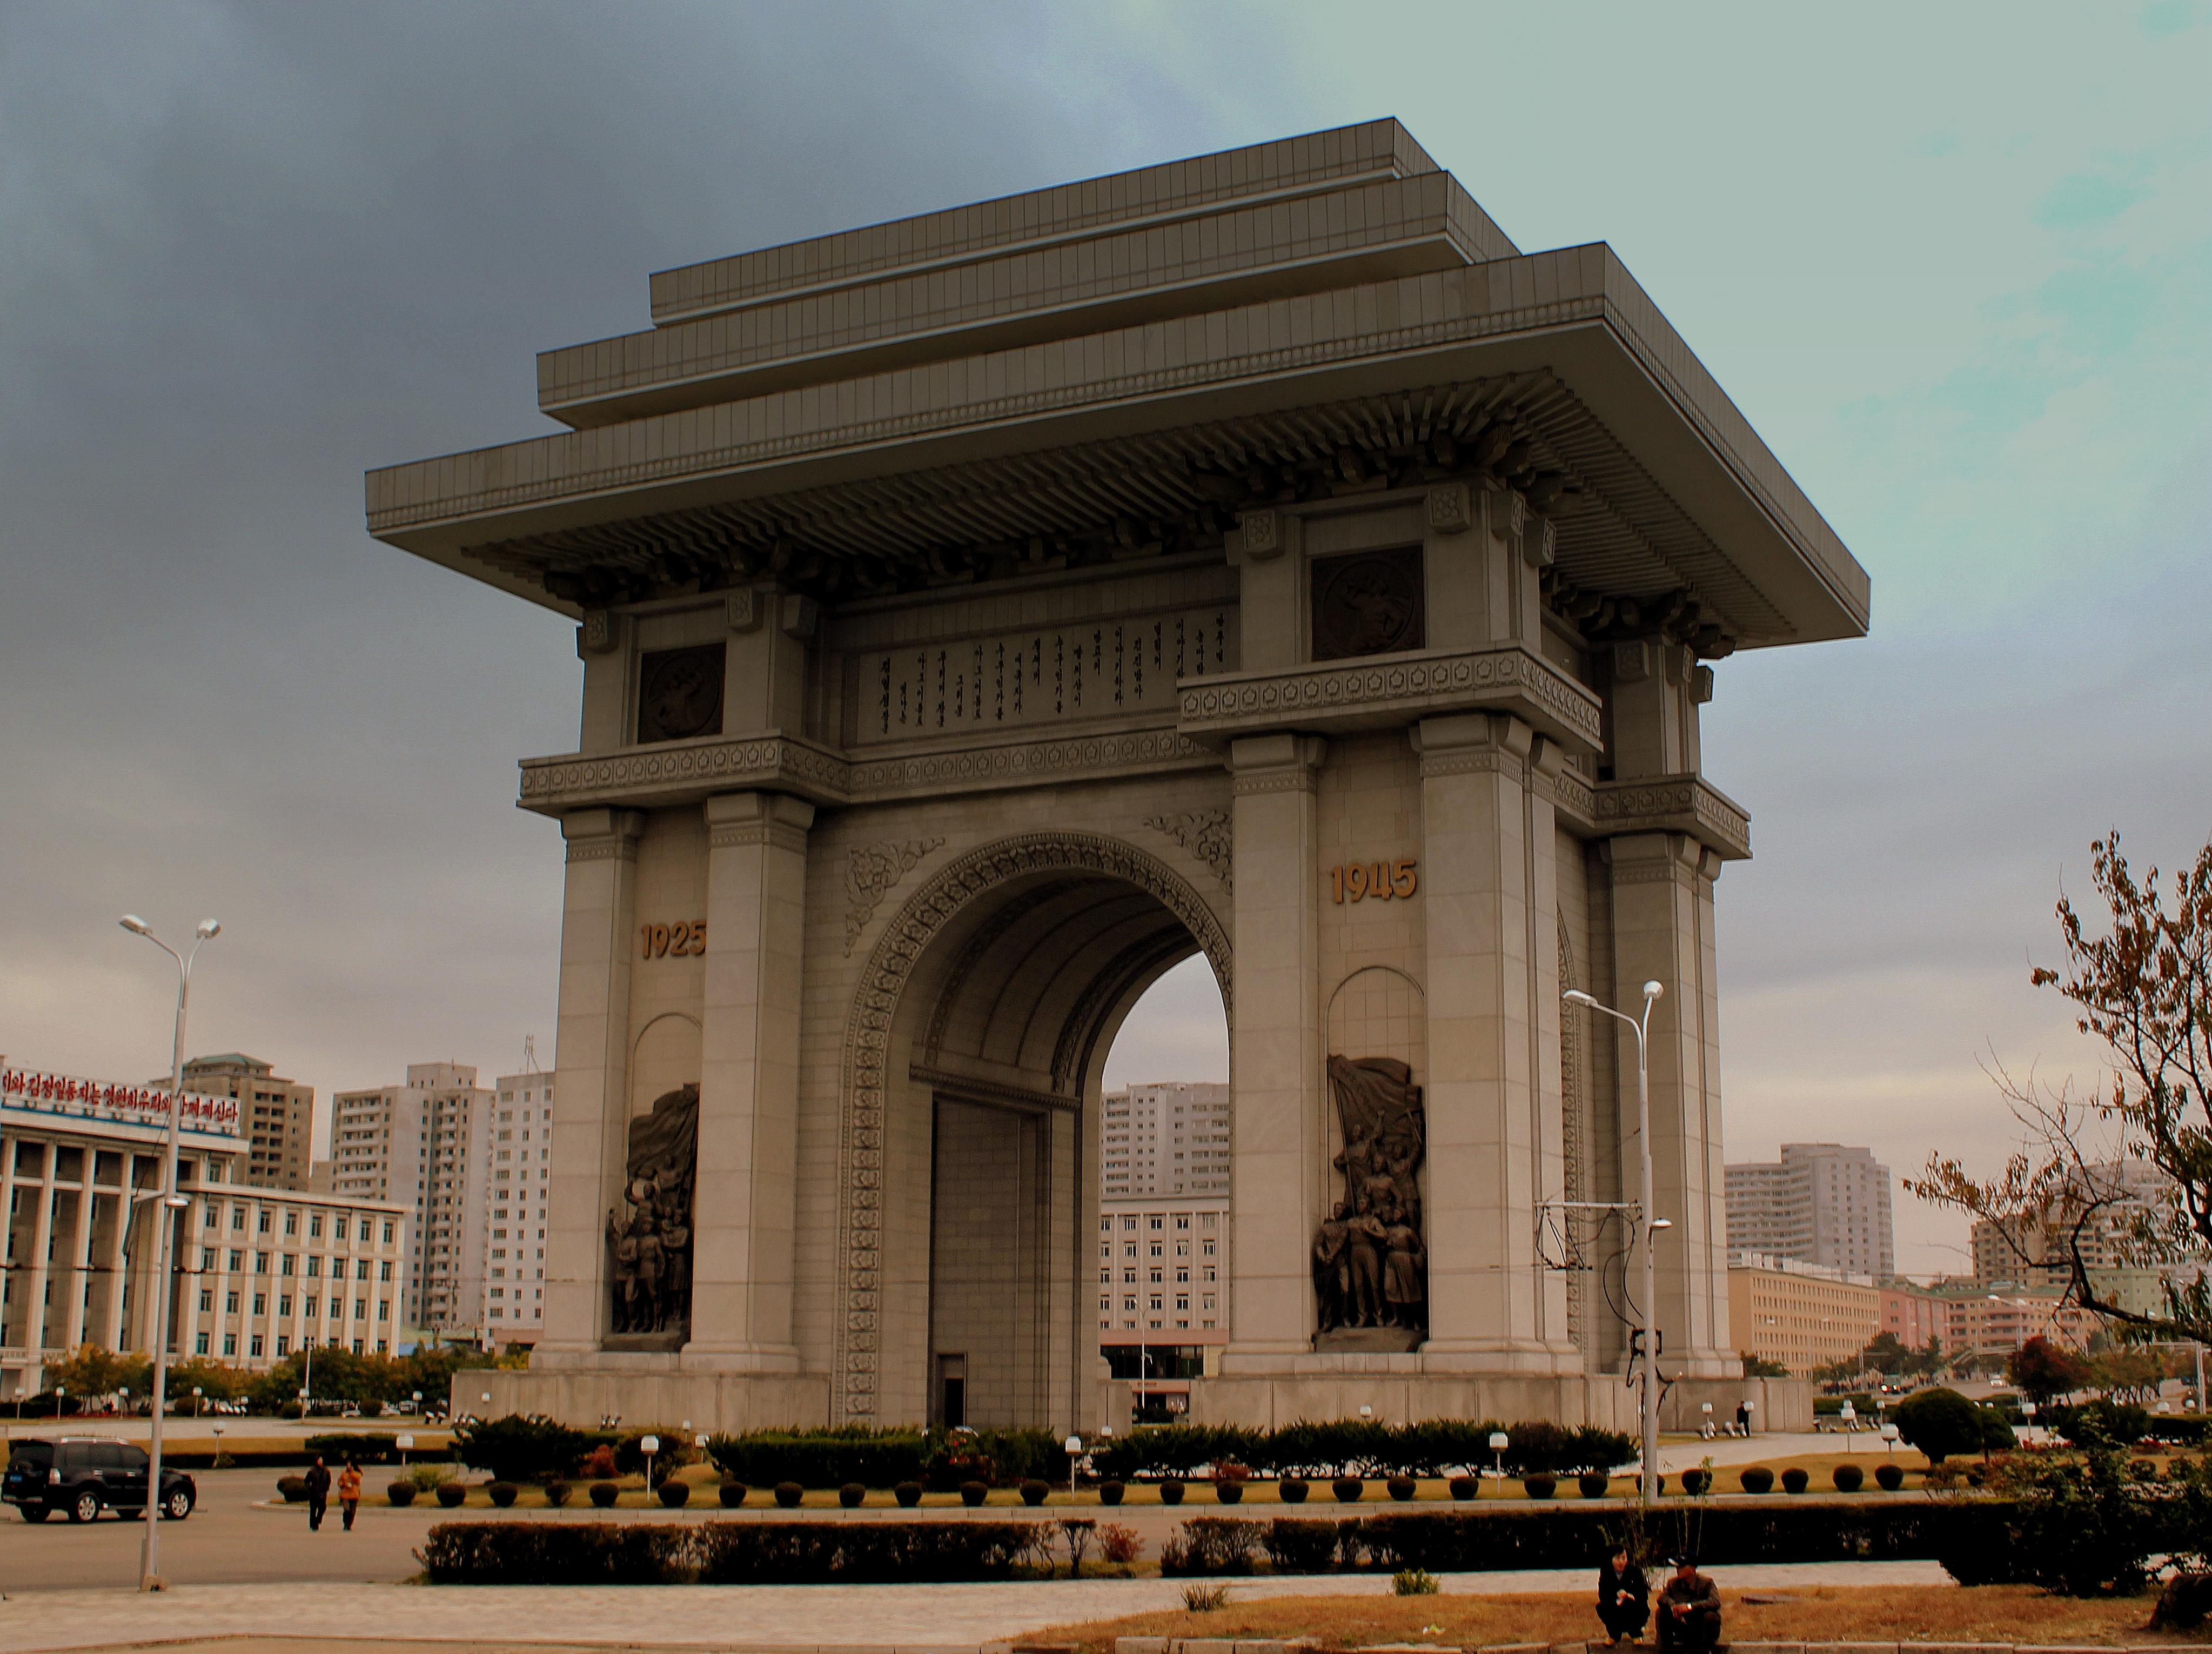 file:arch of triumph pyongyang city dpr korea oct 2012 (8166213131